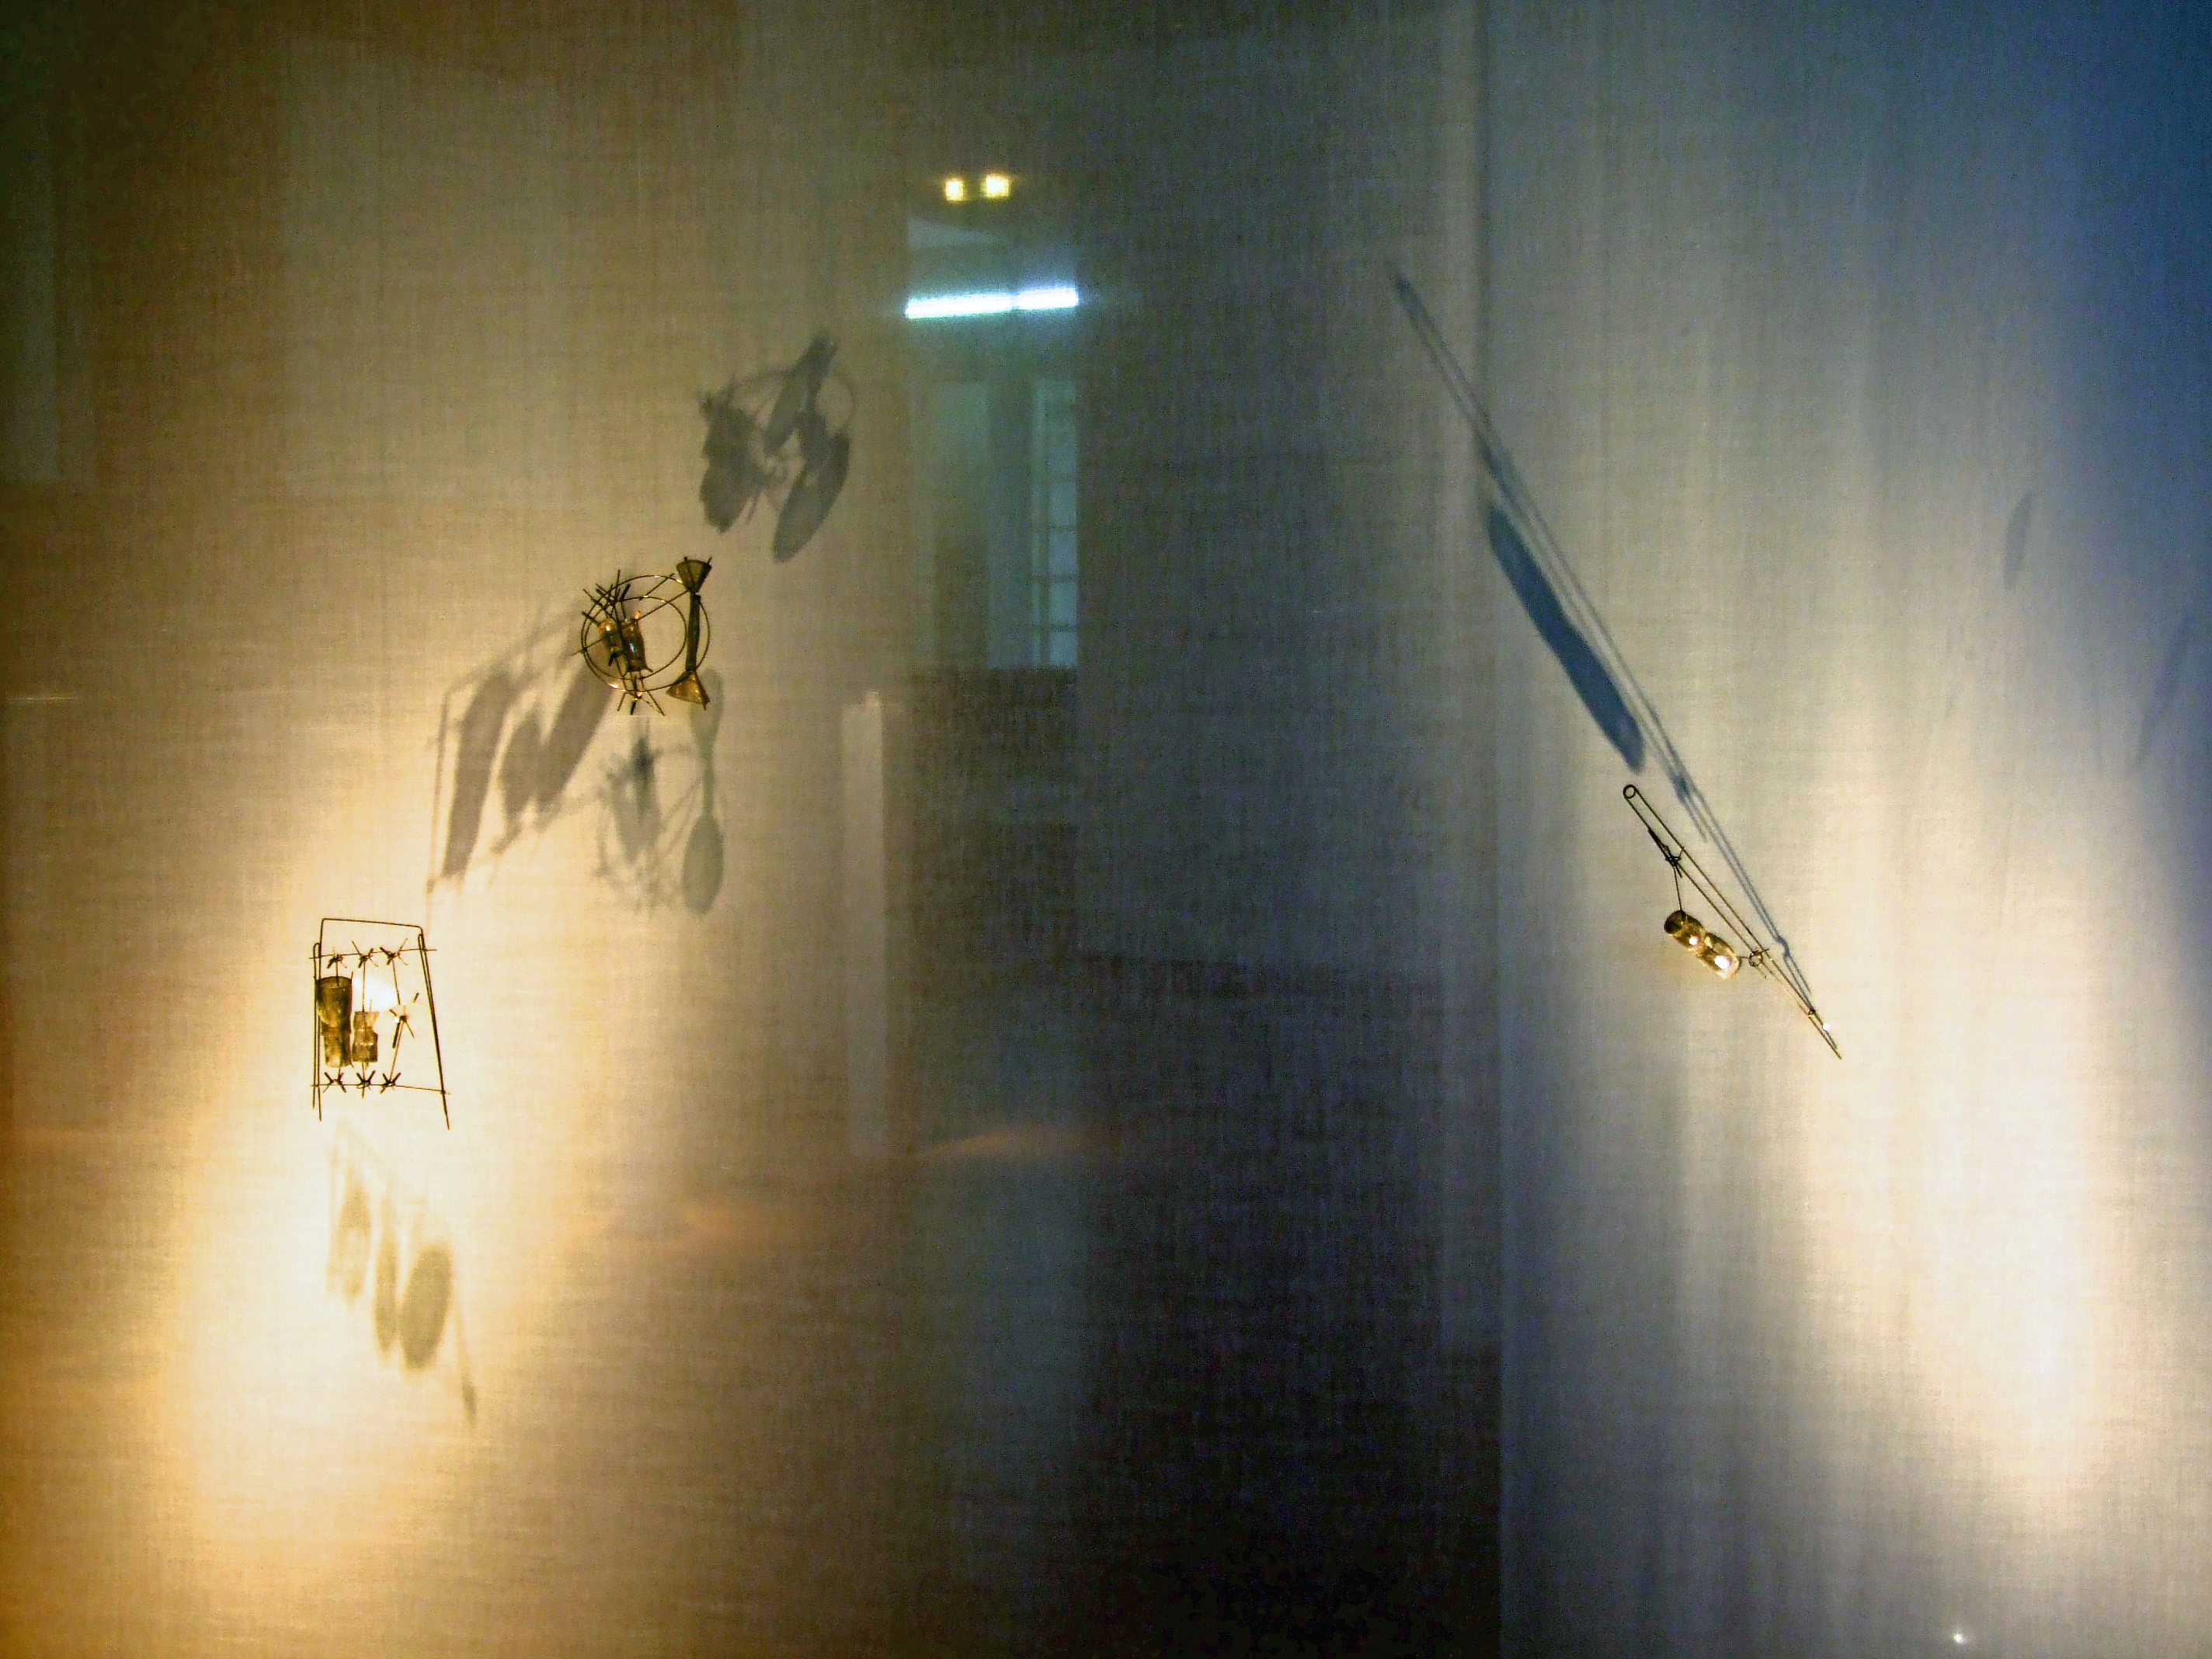 Ornament ohne Ornament, Franz Bette. Museum Angewandte Kunst, 3 mei 2007. Foto Dontworry, tentoonstelling